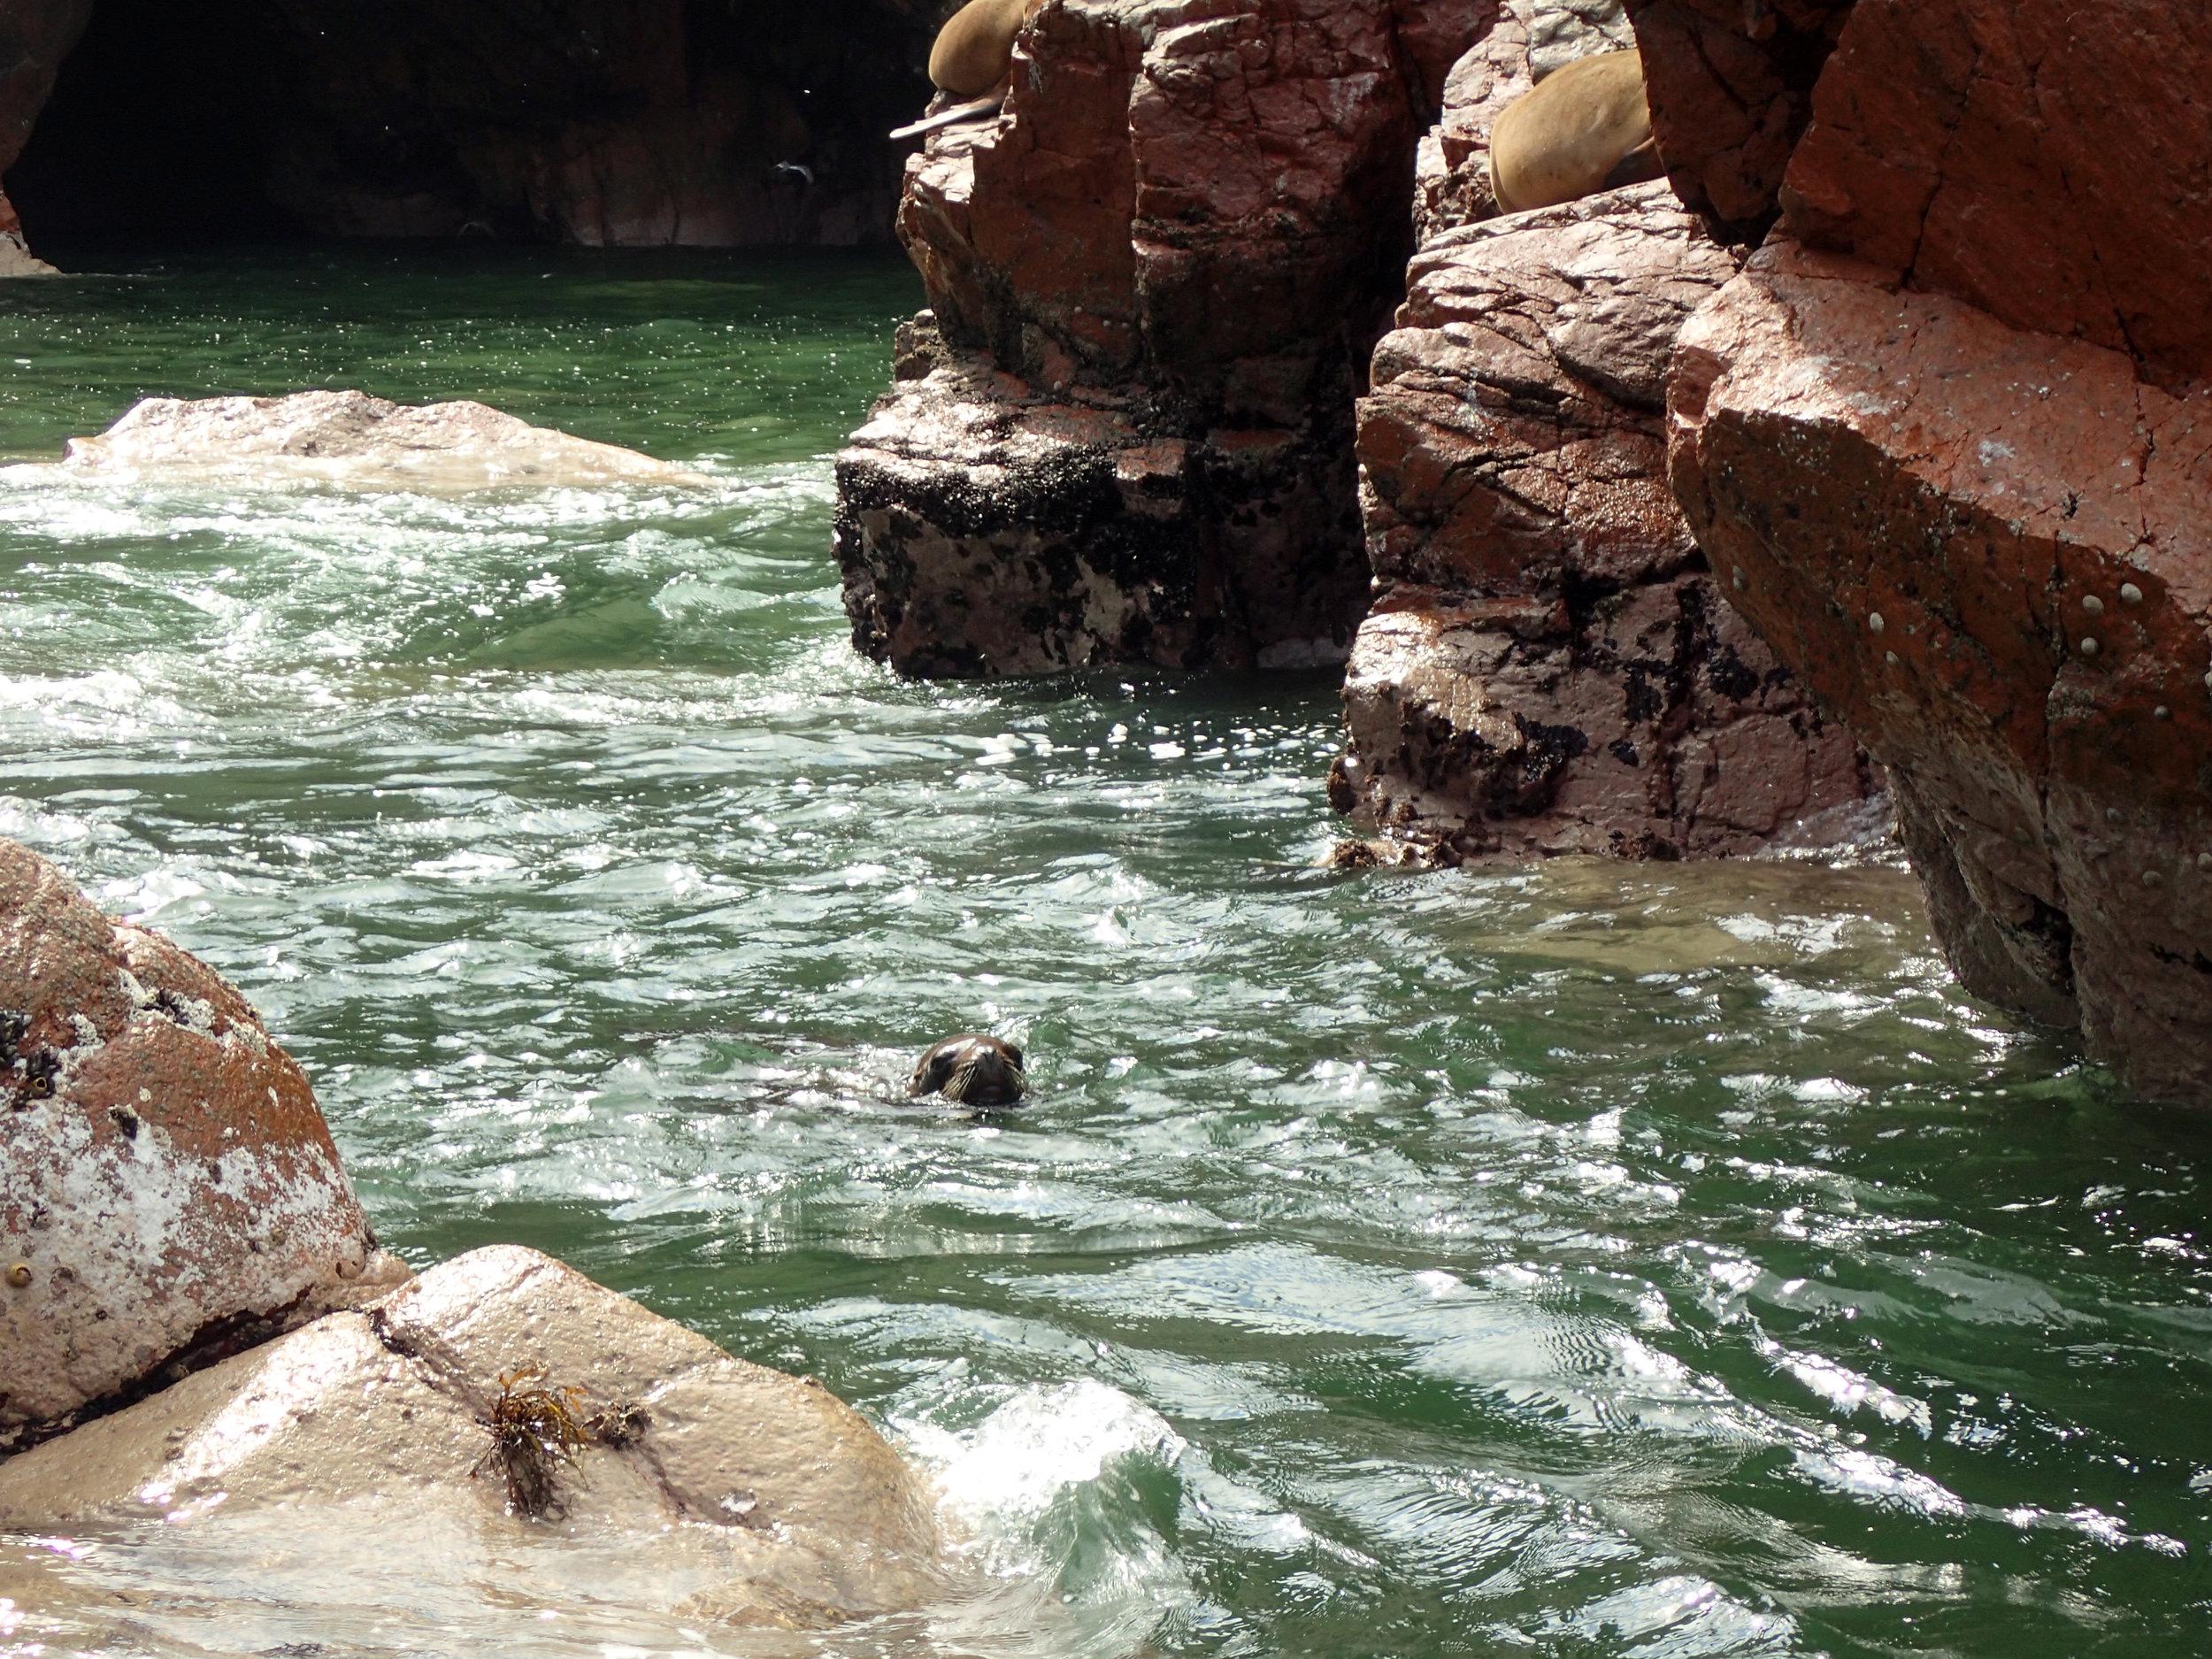 swimming sea lion.jpg